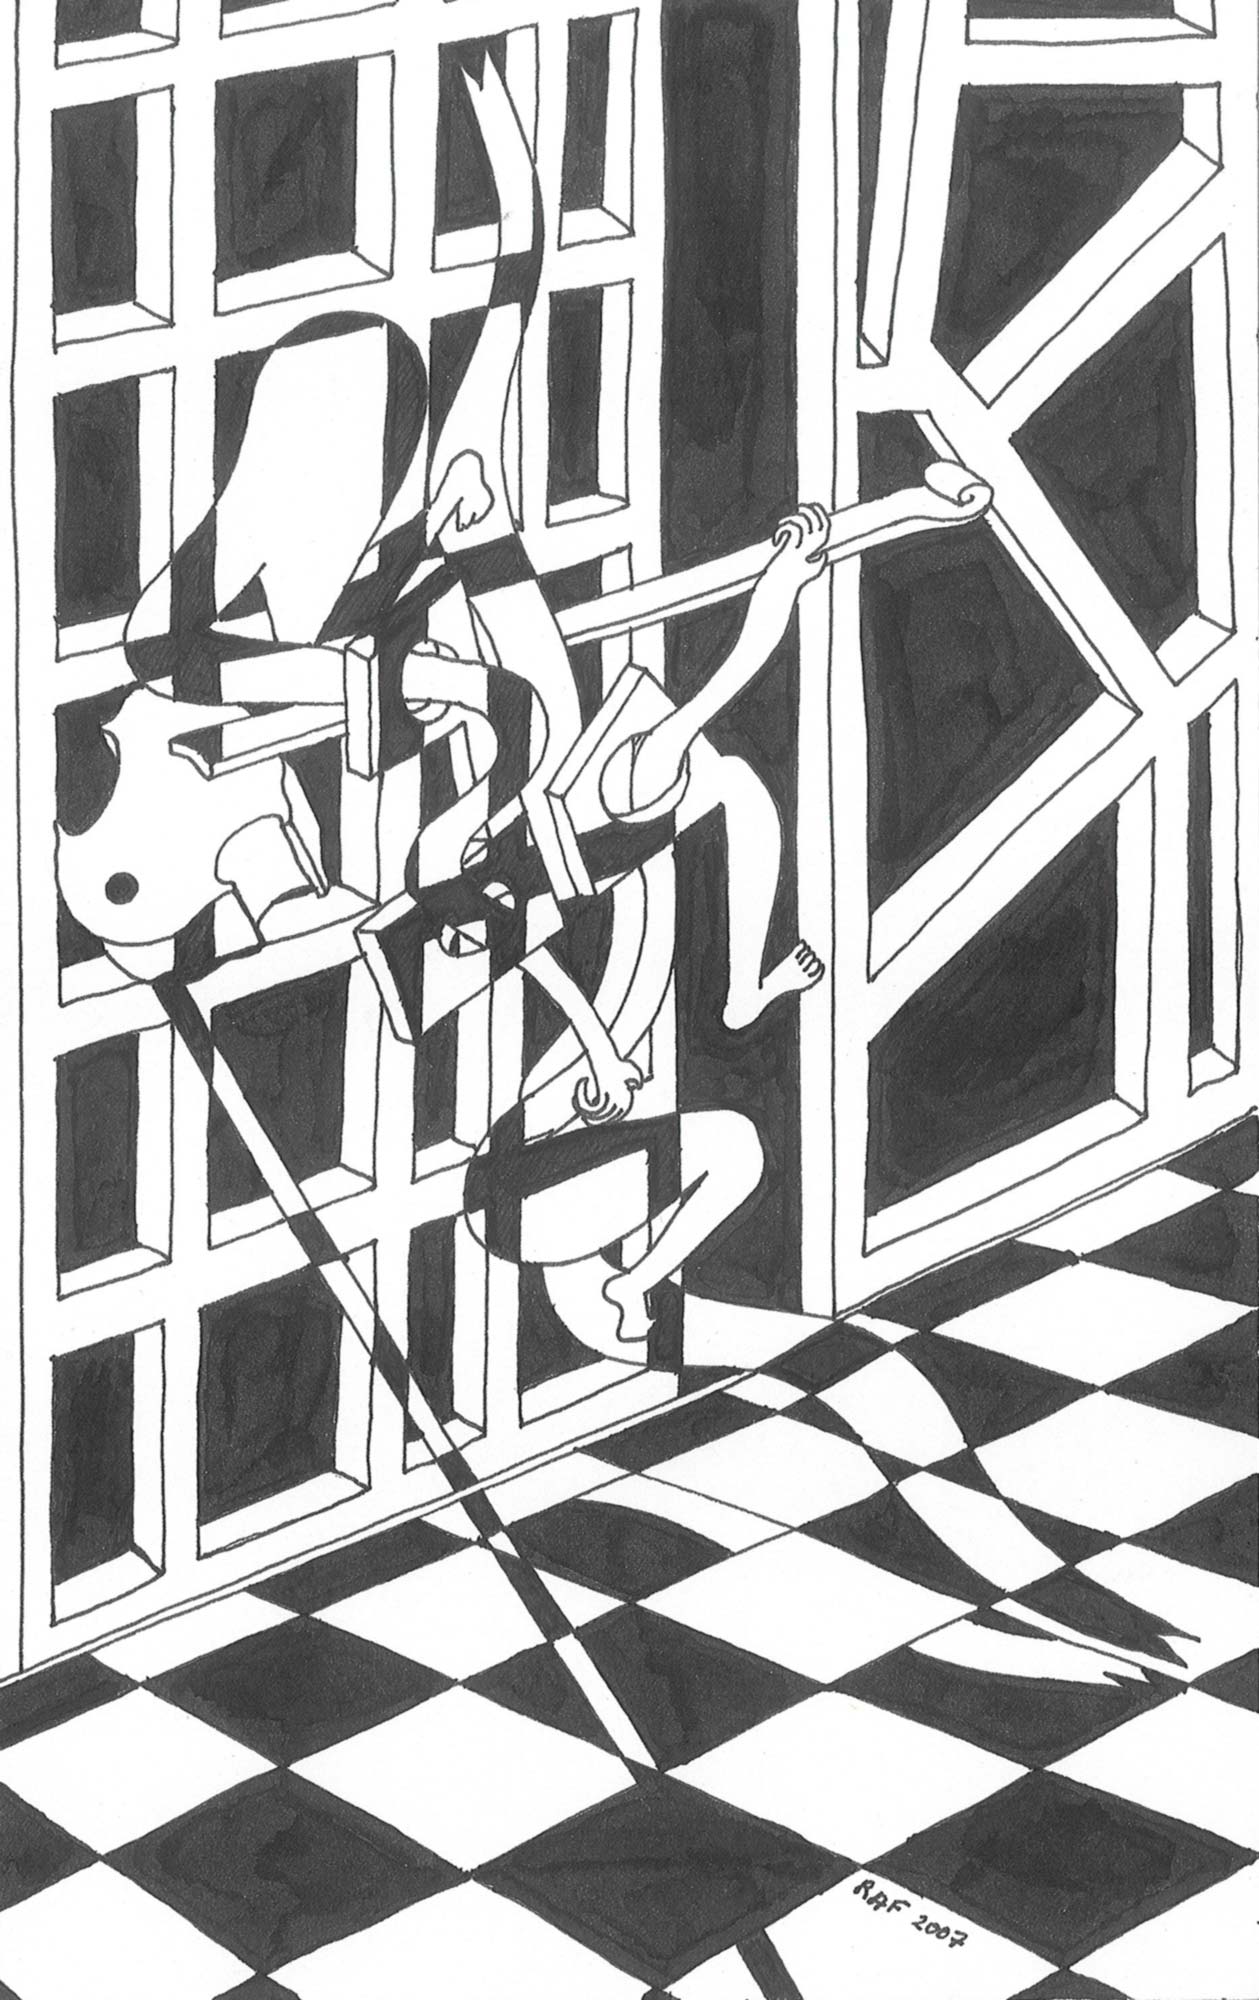 Le bal masque, dessin, Raf Listowski, 2007